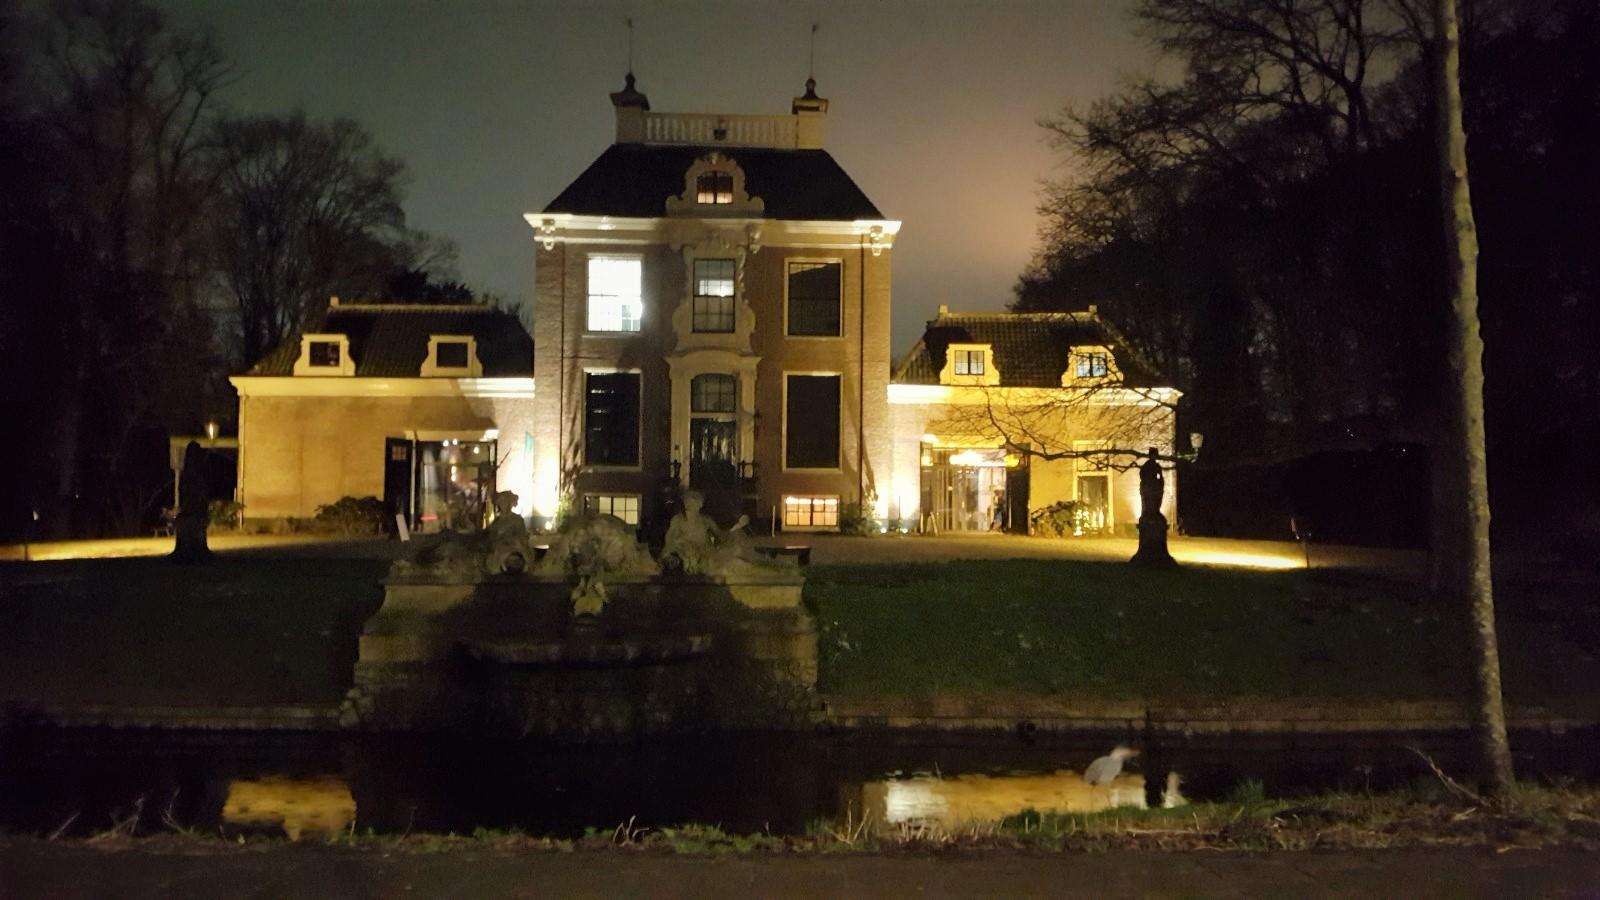 MIR2019 - Award Event in Huize Frankendael